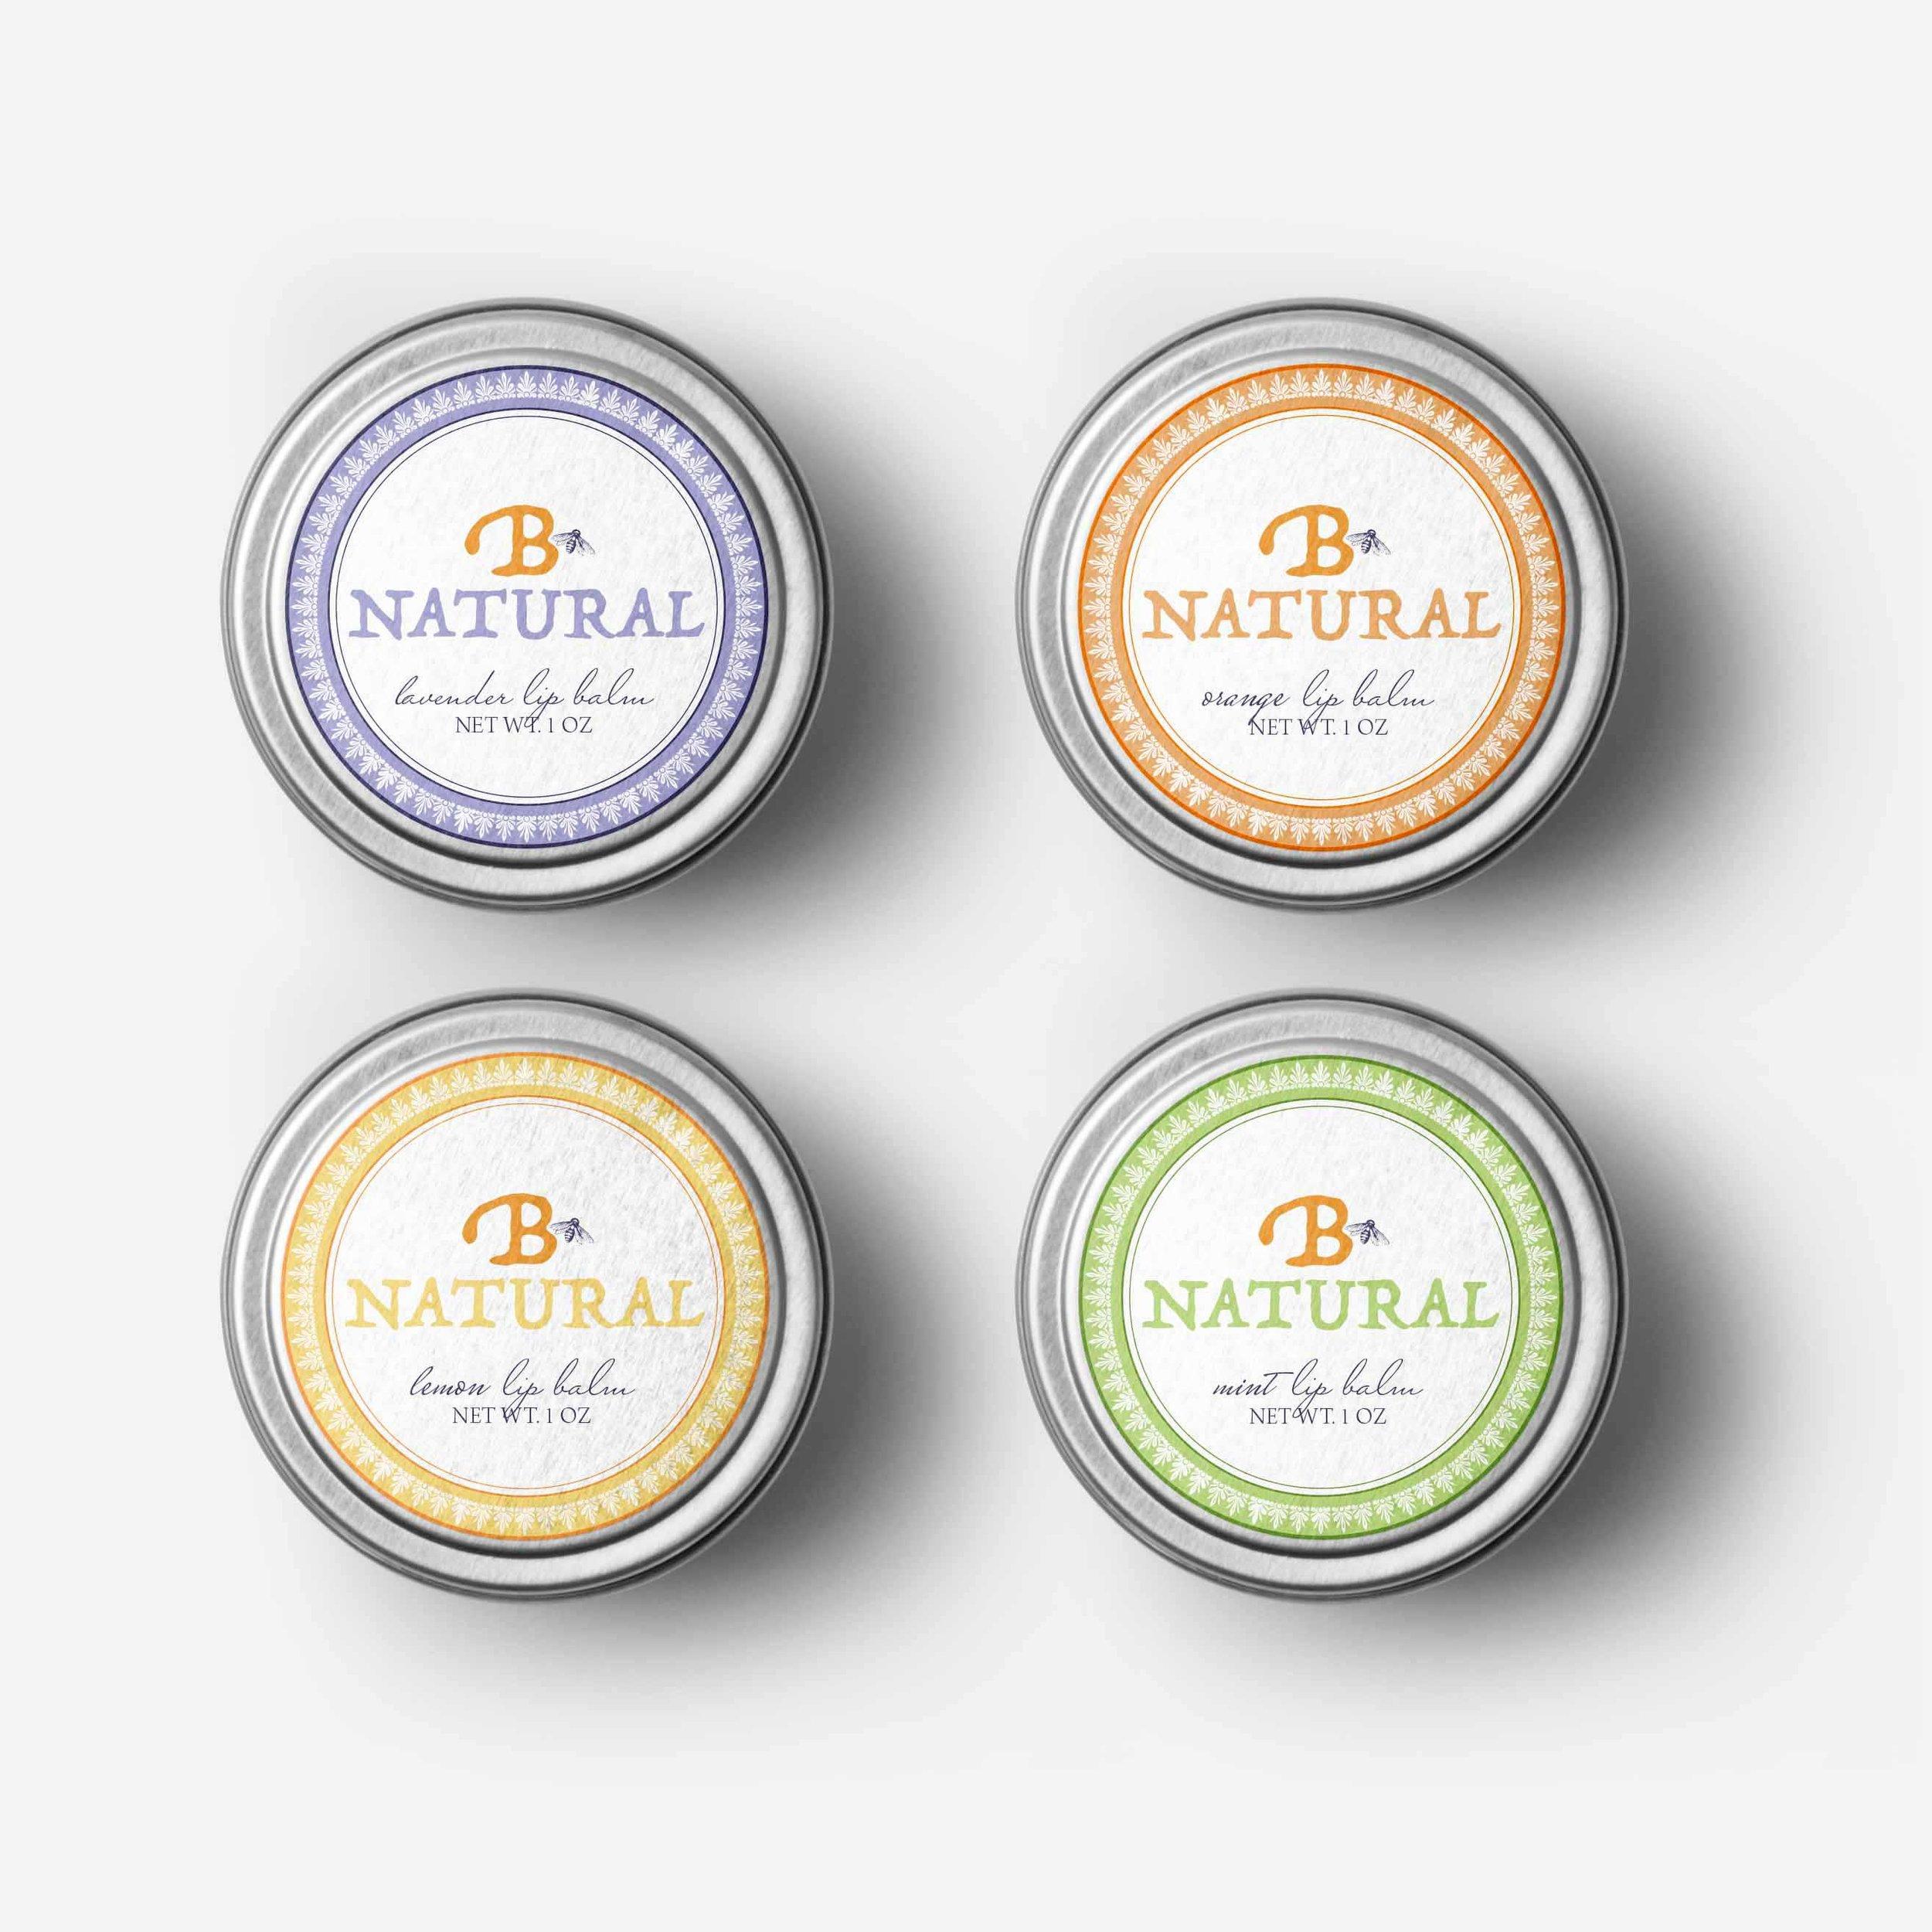 Bee-natural-lip-balm-labels.jpg